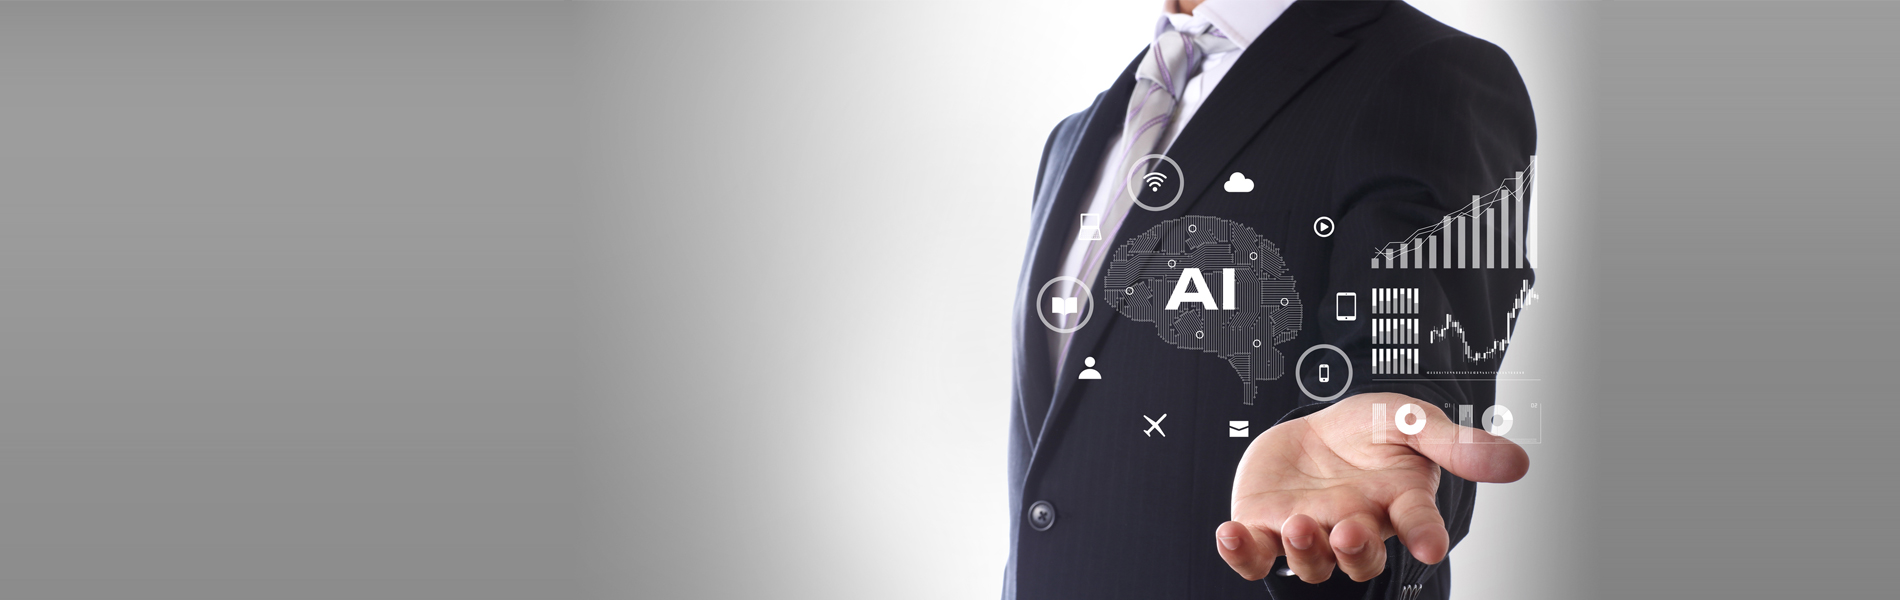 AIプログラミング技術者養成講座開講